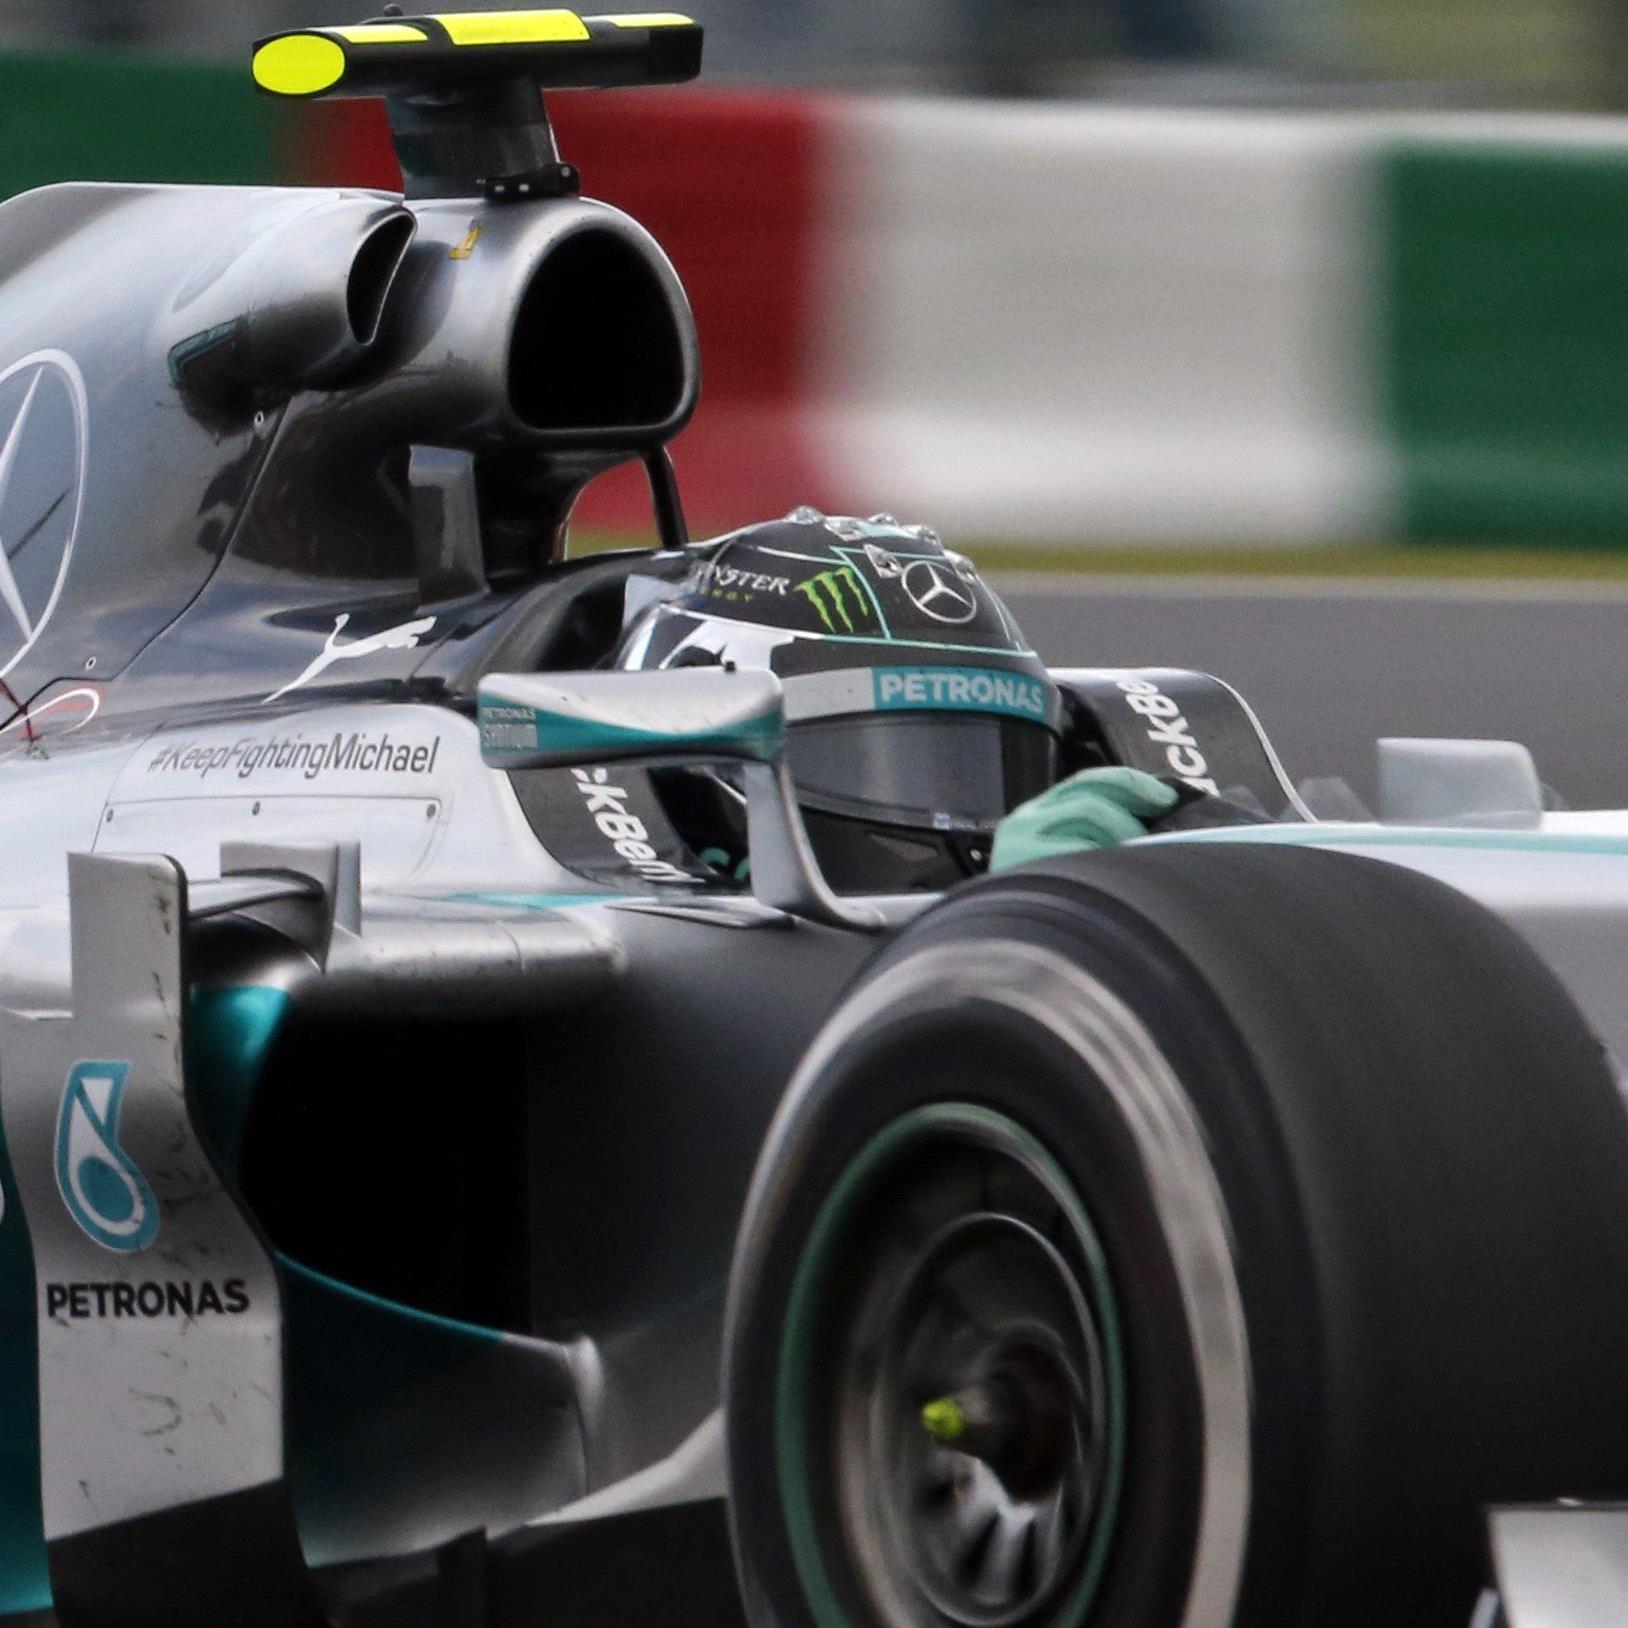 Ricciardo Sechster - Vierfach-Weltmeister Vettel nur Neunter.